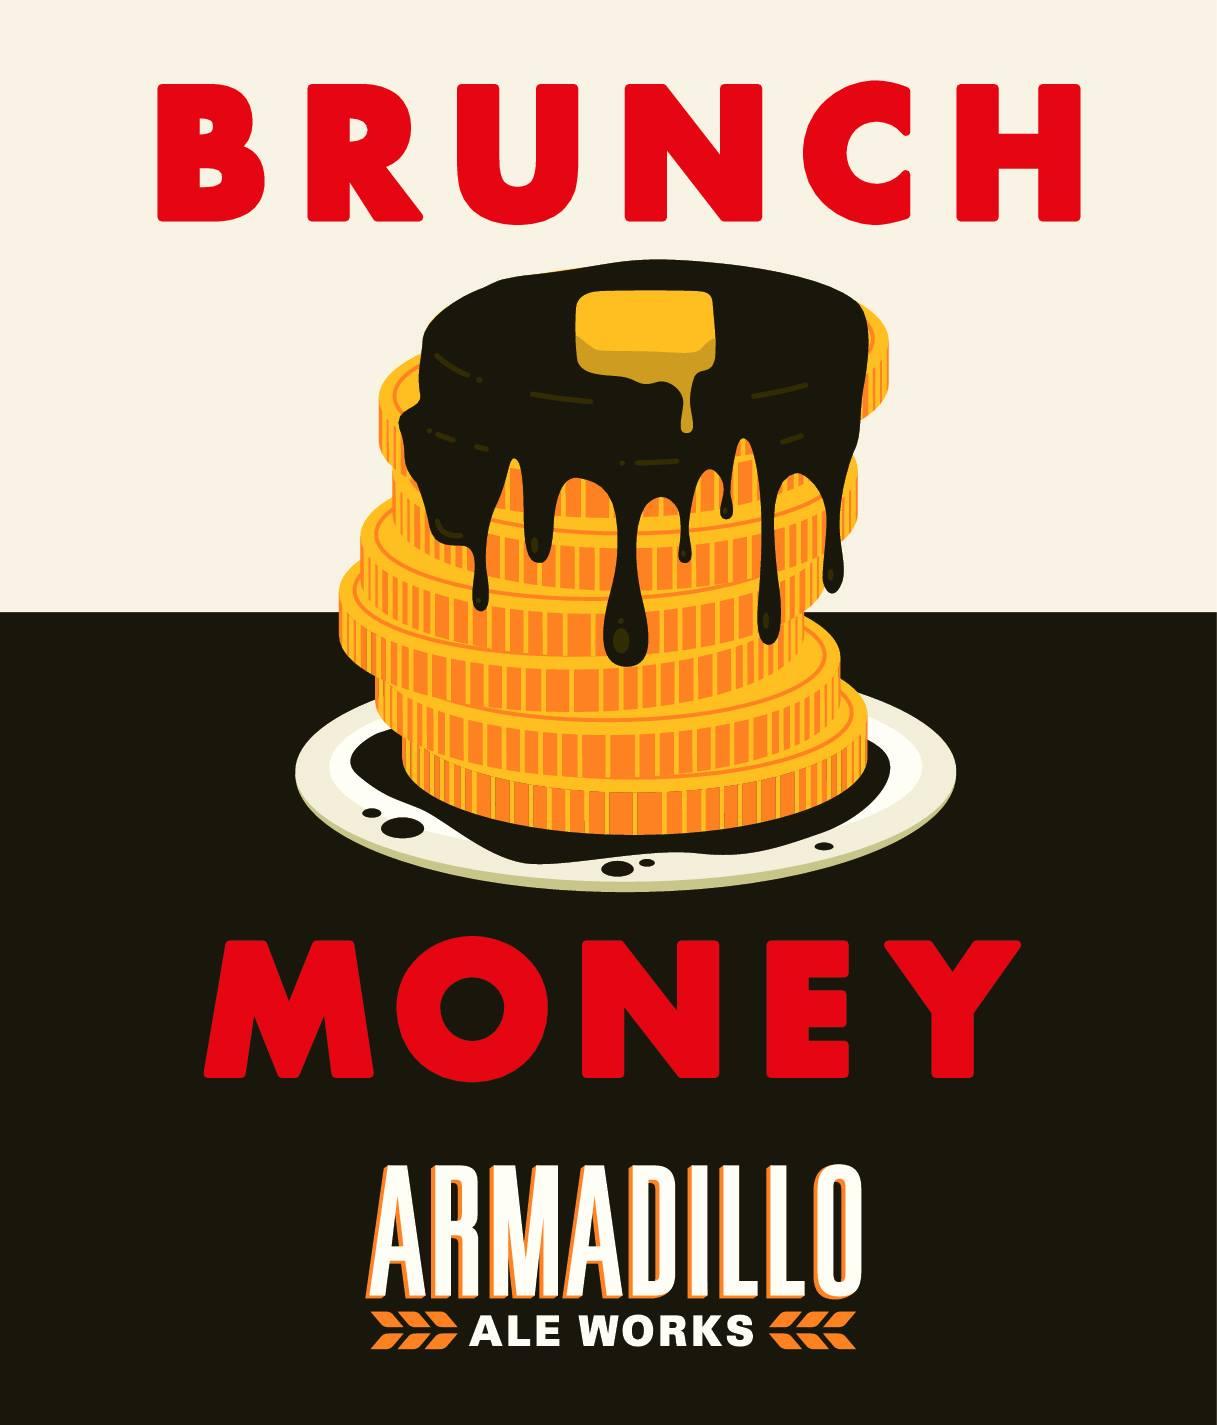 Armadillo-Ale-Works-Brunch-Money-Poster.jpg